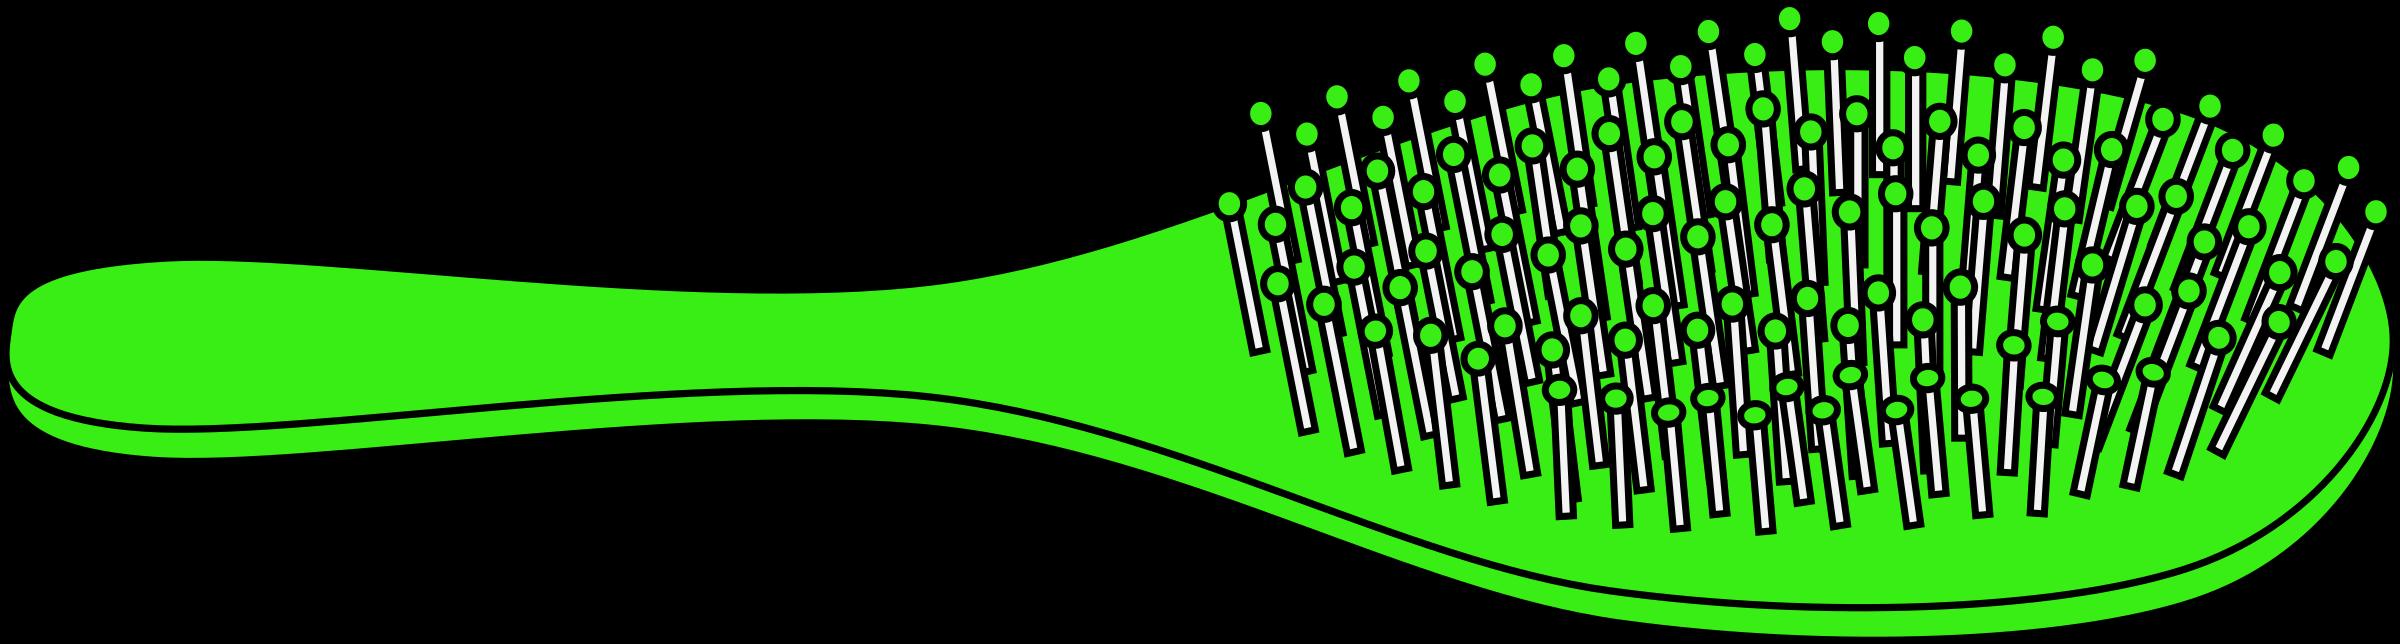 clip art Hairbrush clipart green. Bright big image png